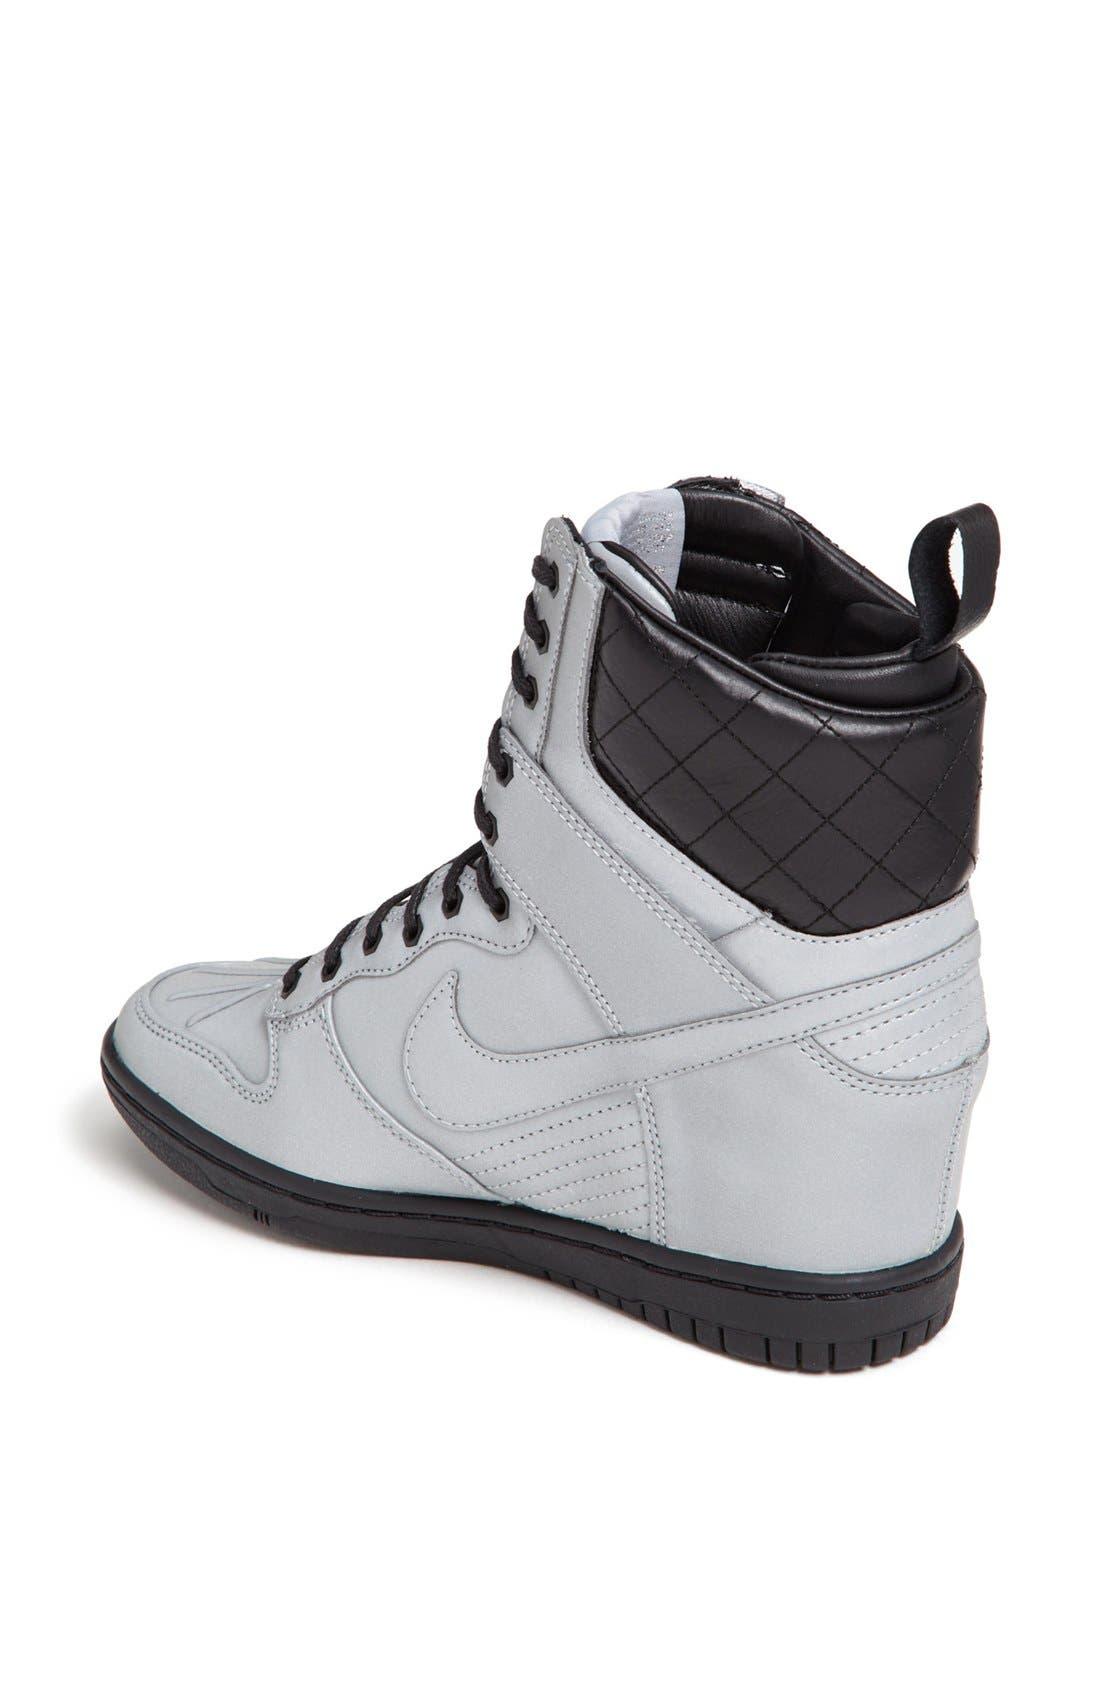 Alternate Image 2  - Nike 'Dunk Sky Hi' Hidden Wedge Sneaker Boot (Women)